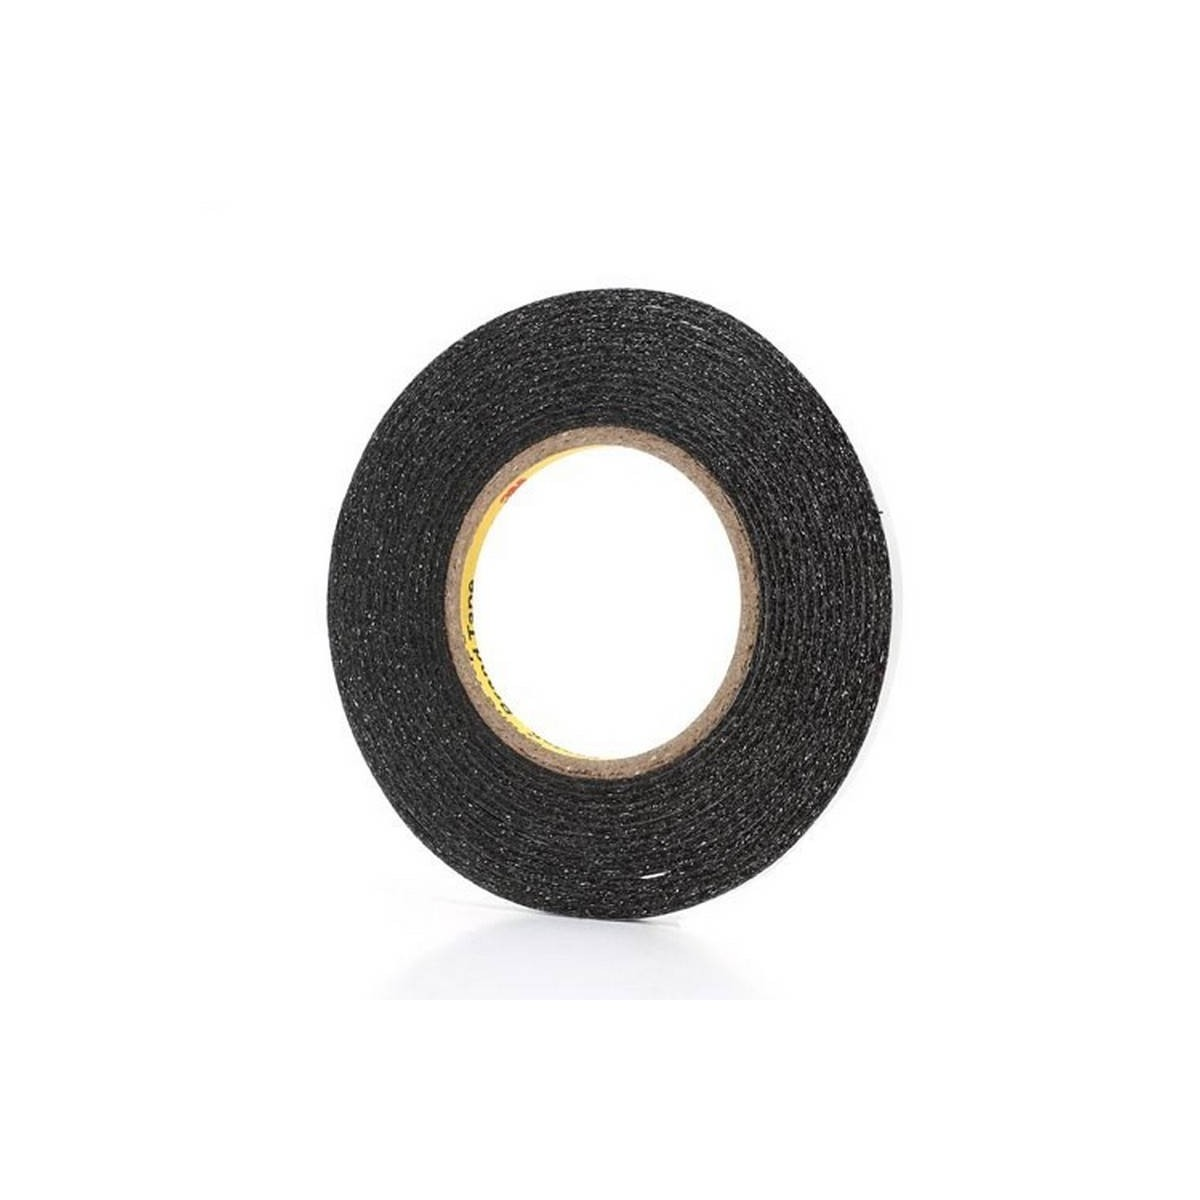 Cinta adhesiva negra extrafina 50m de 6mm de ancho